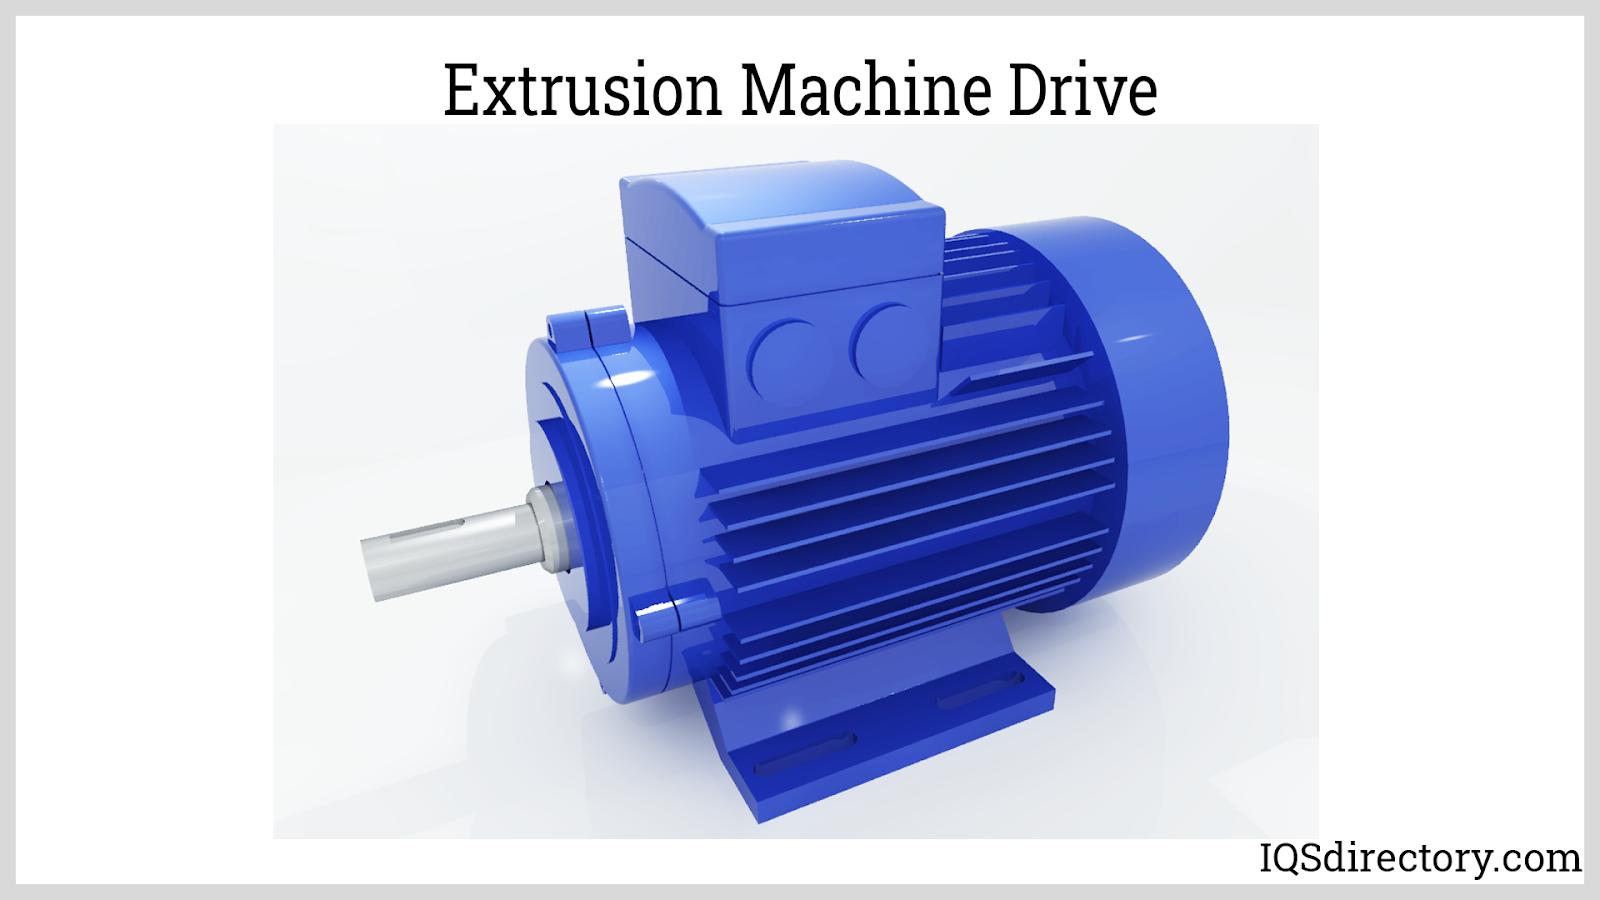 Extrusion Machine Drive